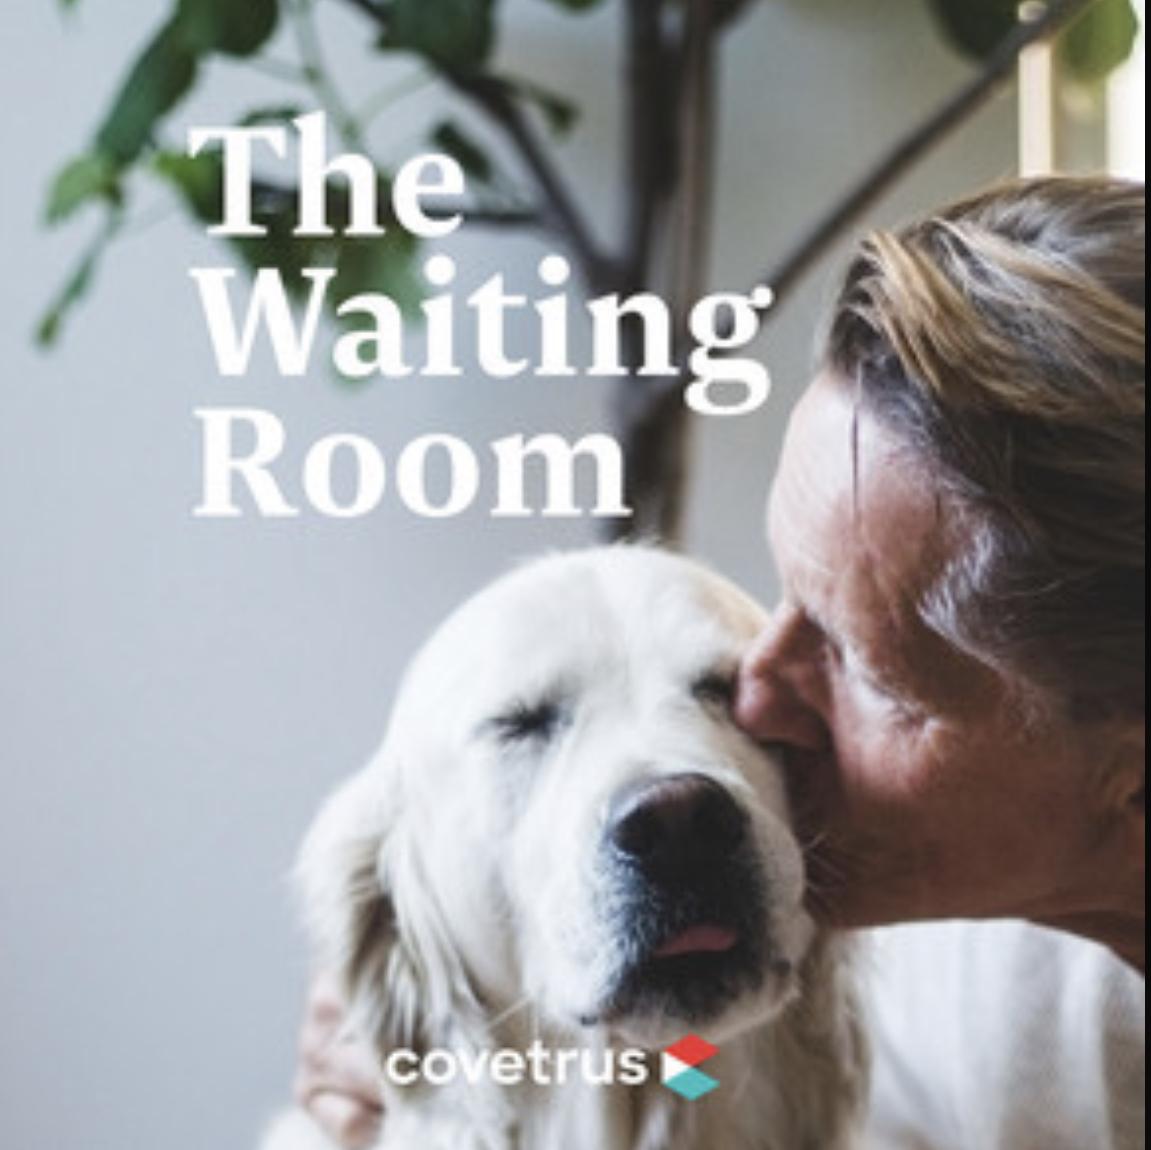 Covetrus-seo-podcast-briony-cullin-marketing-for-vets-veterinarians.jpg